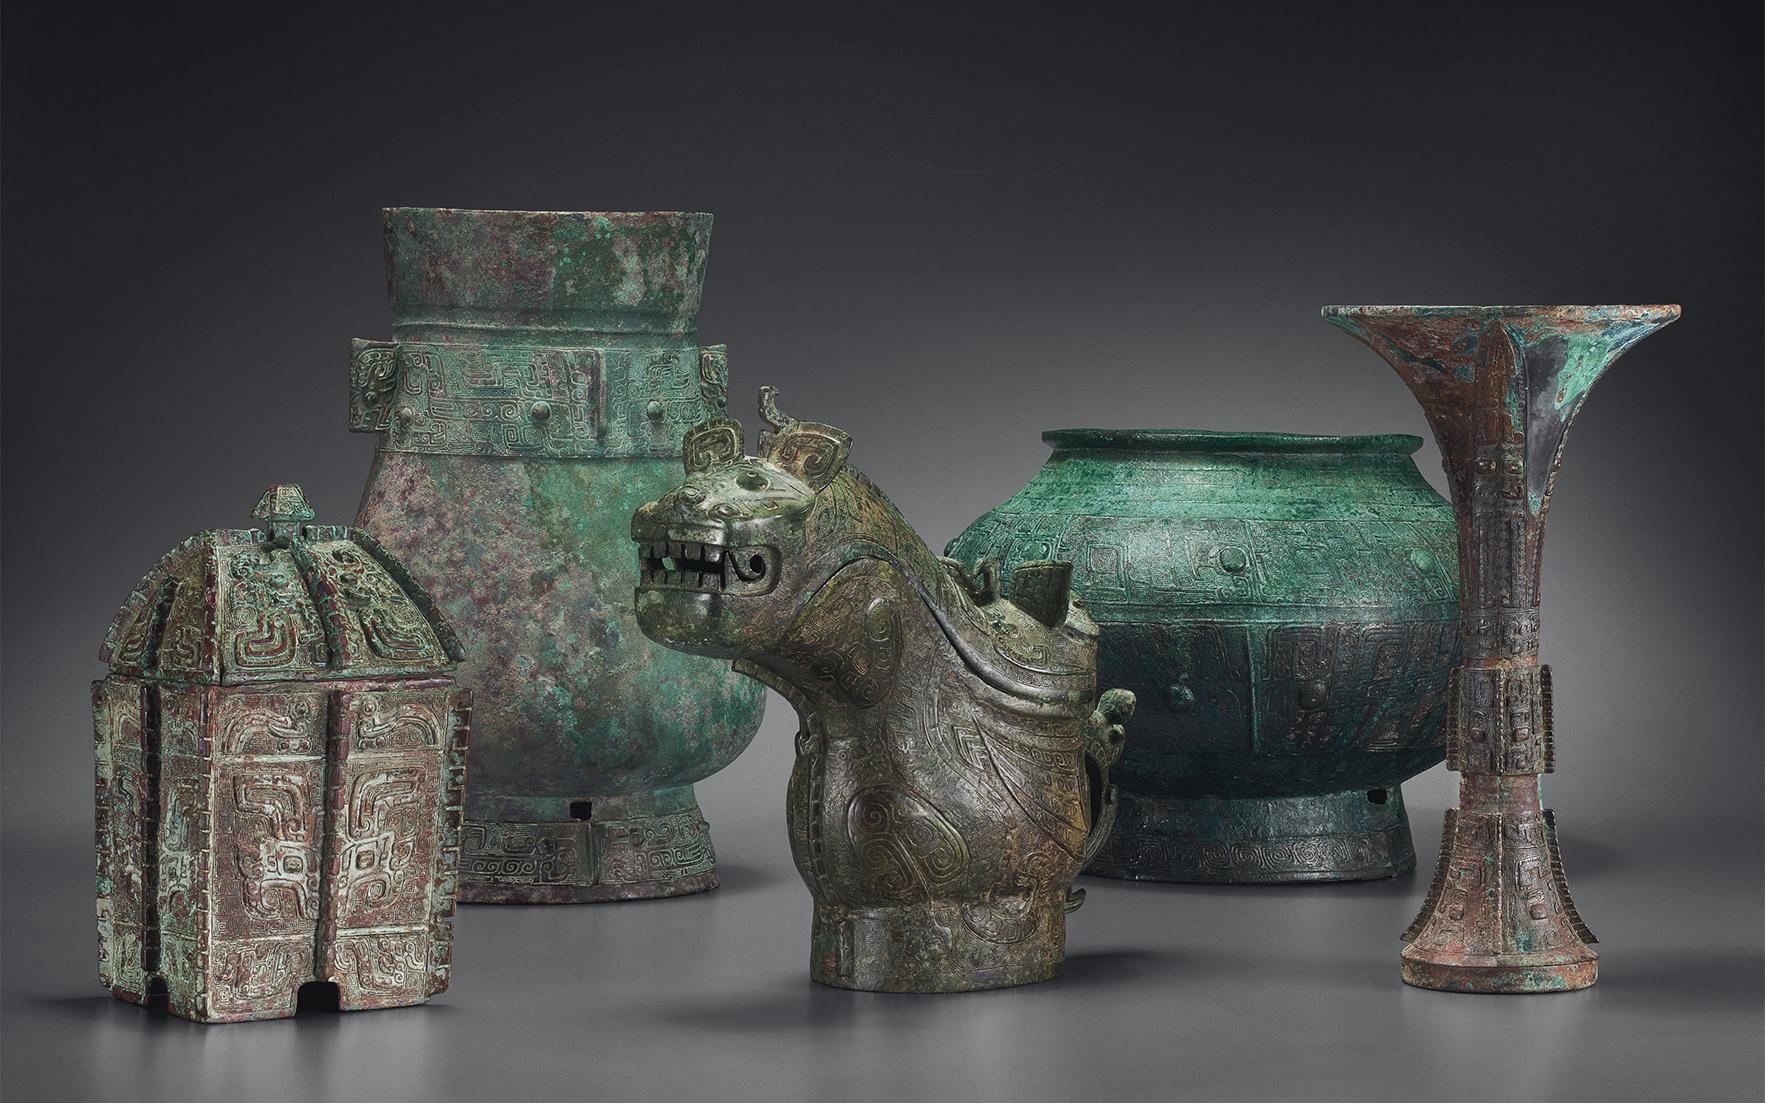 Chinese archaicbronzes